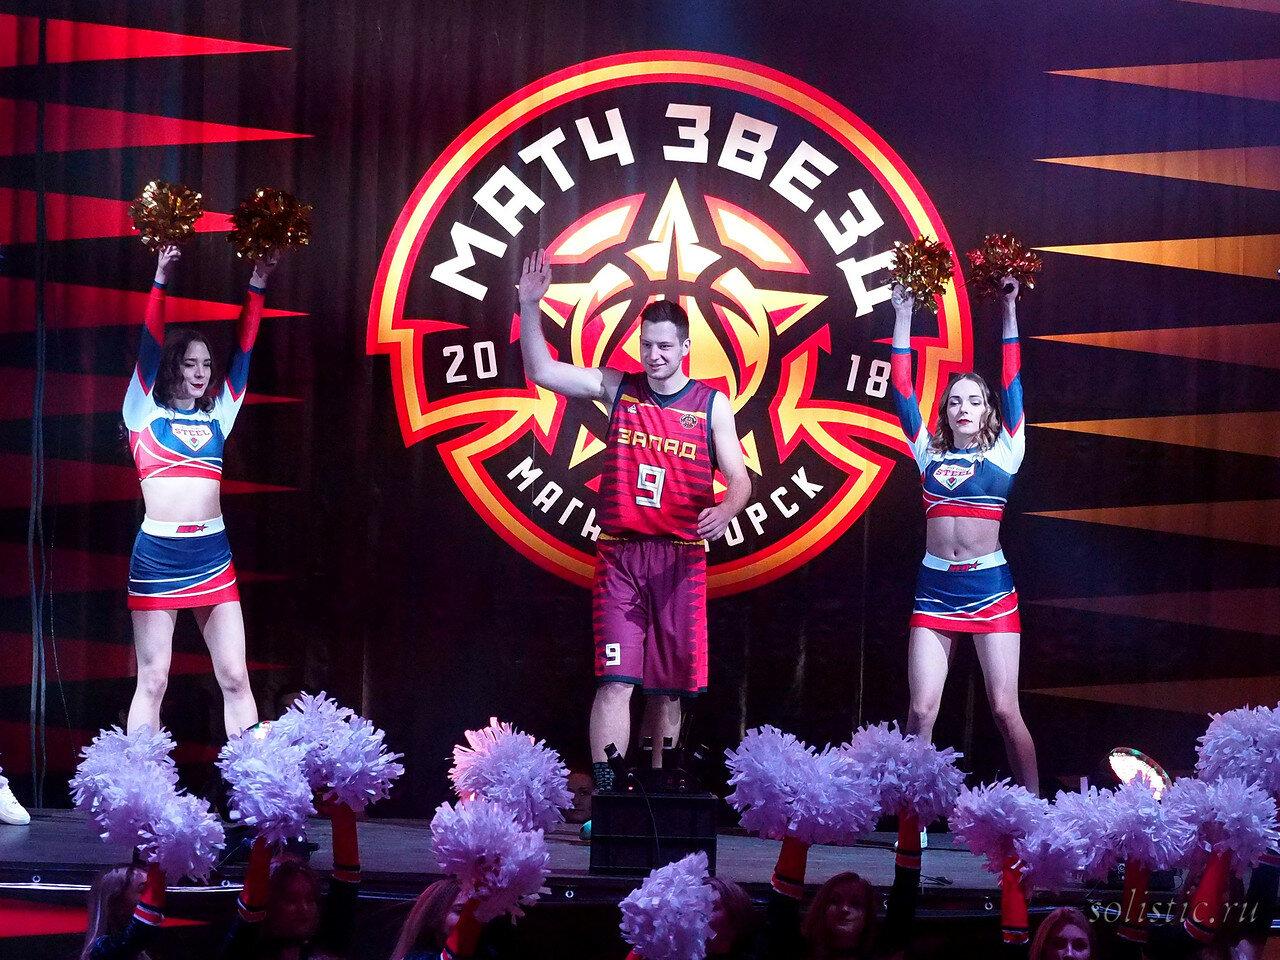 19 Матч звезд АСБ 2018 (ассоциации студенческого баскетбола)